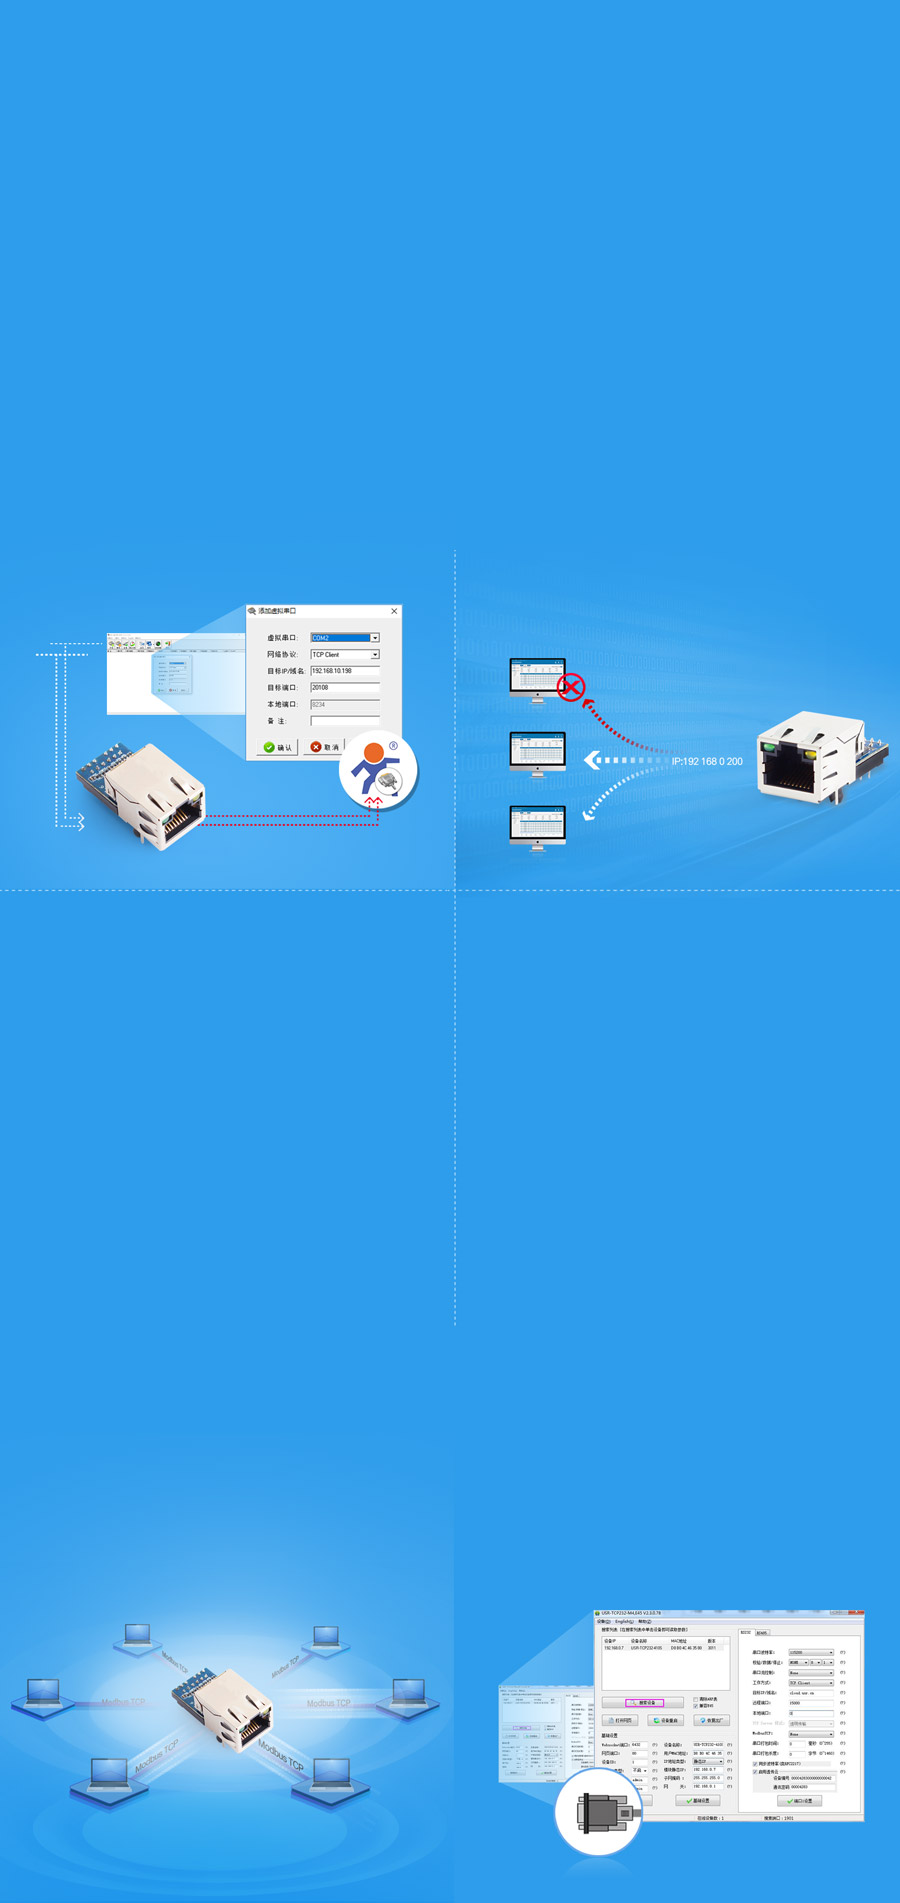 USR-K7 supports Virtual COM